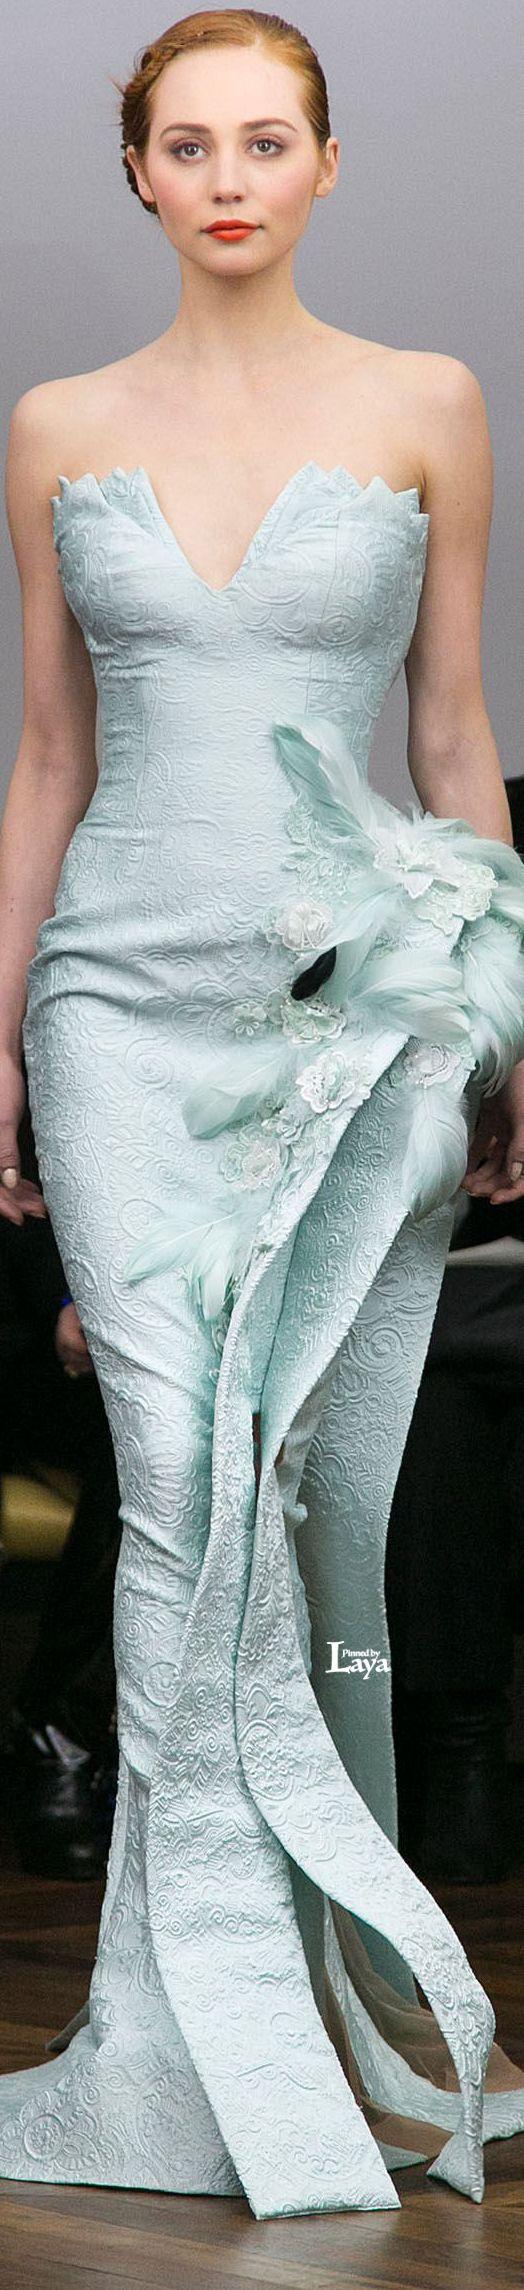 72 best TONY YAACOUB ♔♔♔ images on Pinterest | High fashion ...